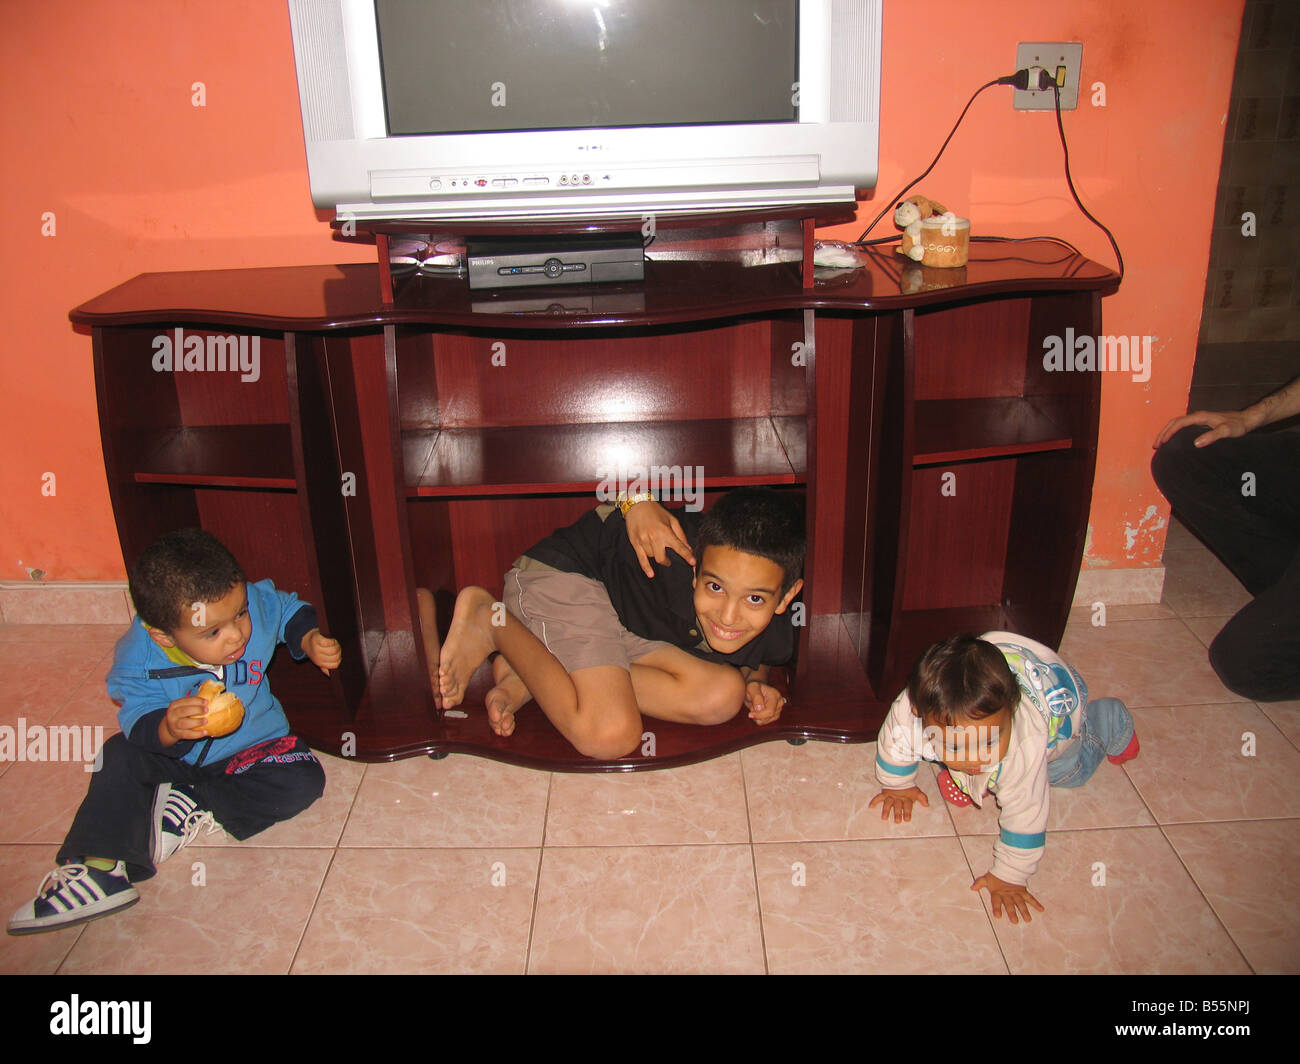 Tres primos feliz (Felipe, Samuel, Gabriel), uno de ellos dentro de un rack de TV, de Sepetiba, Río de Janeiro, Brasil / Brazil Foto de stock